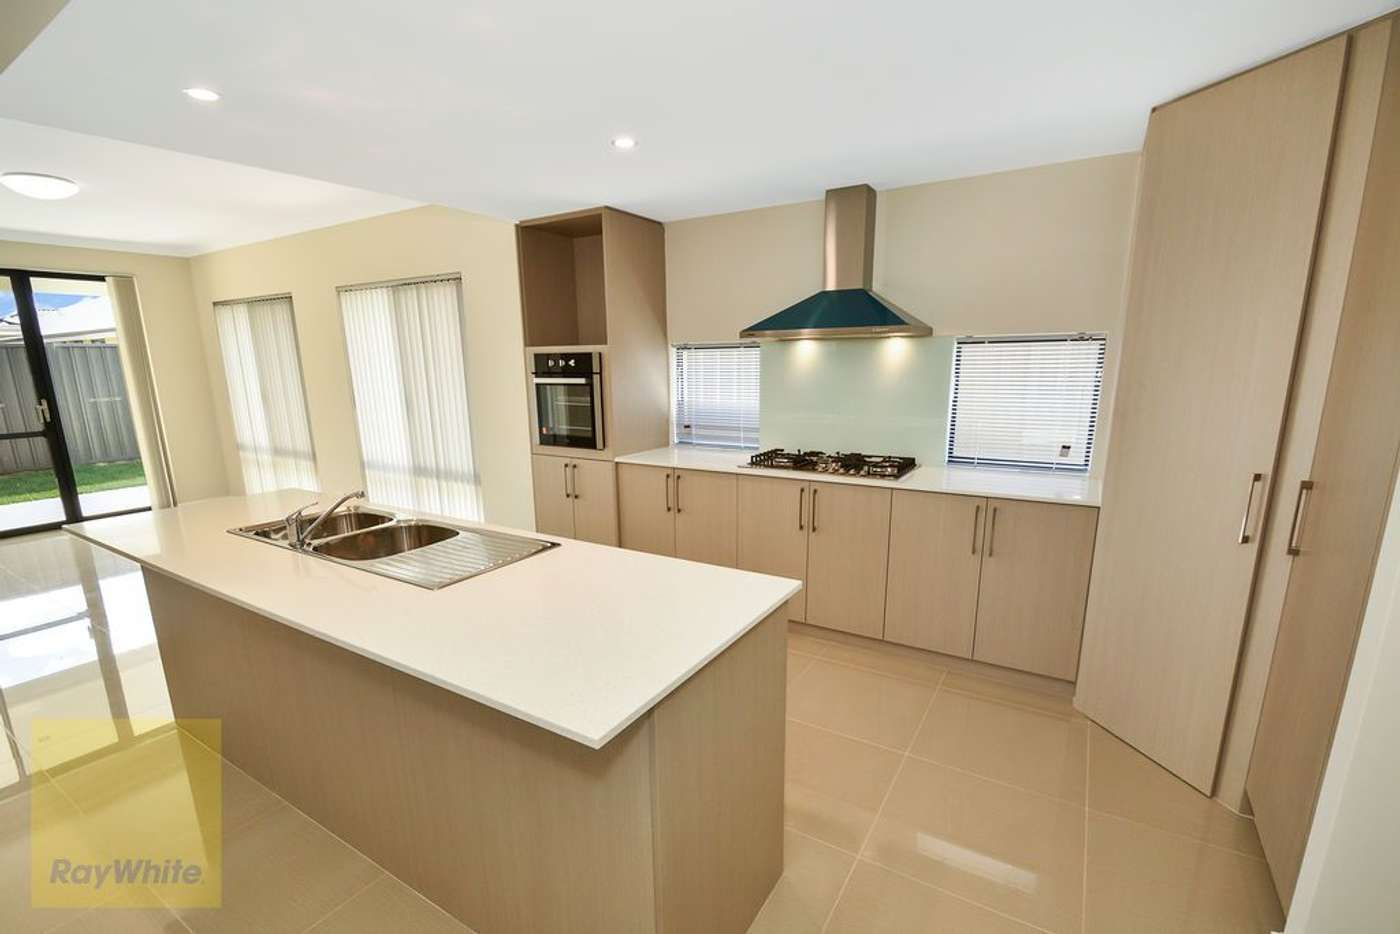 Main view of Homely house listing, 58 Castella Drive, Caversham WA 6055